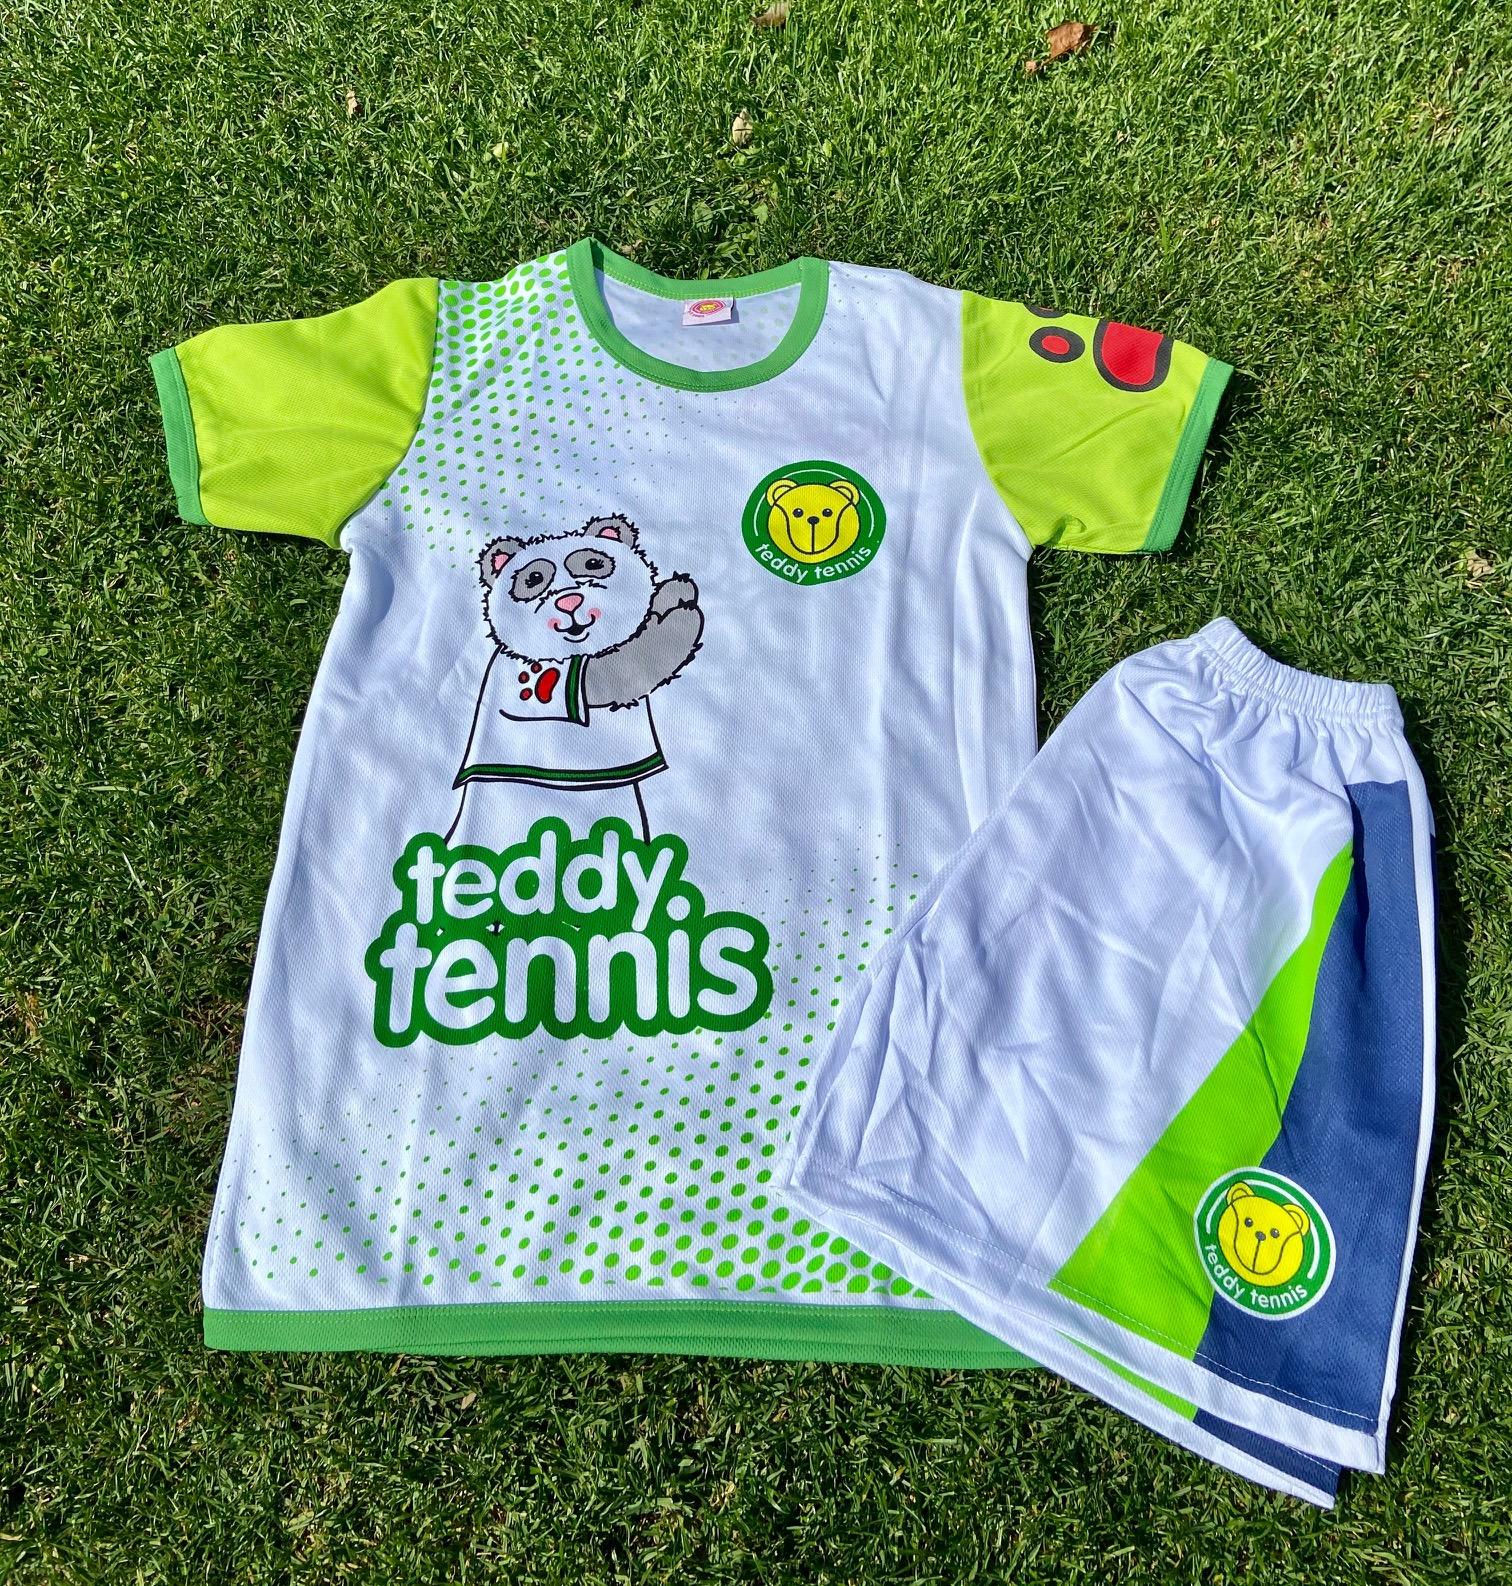 Tennis Shirt & Shorts, 2-3 Years, Amanda Panda Design